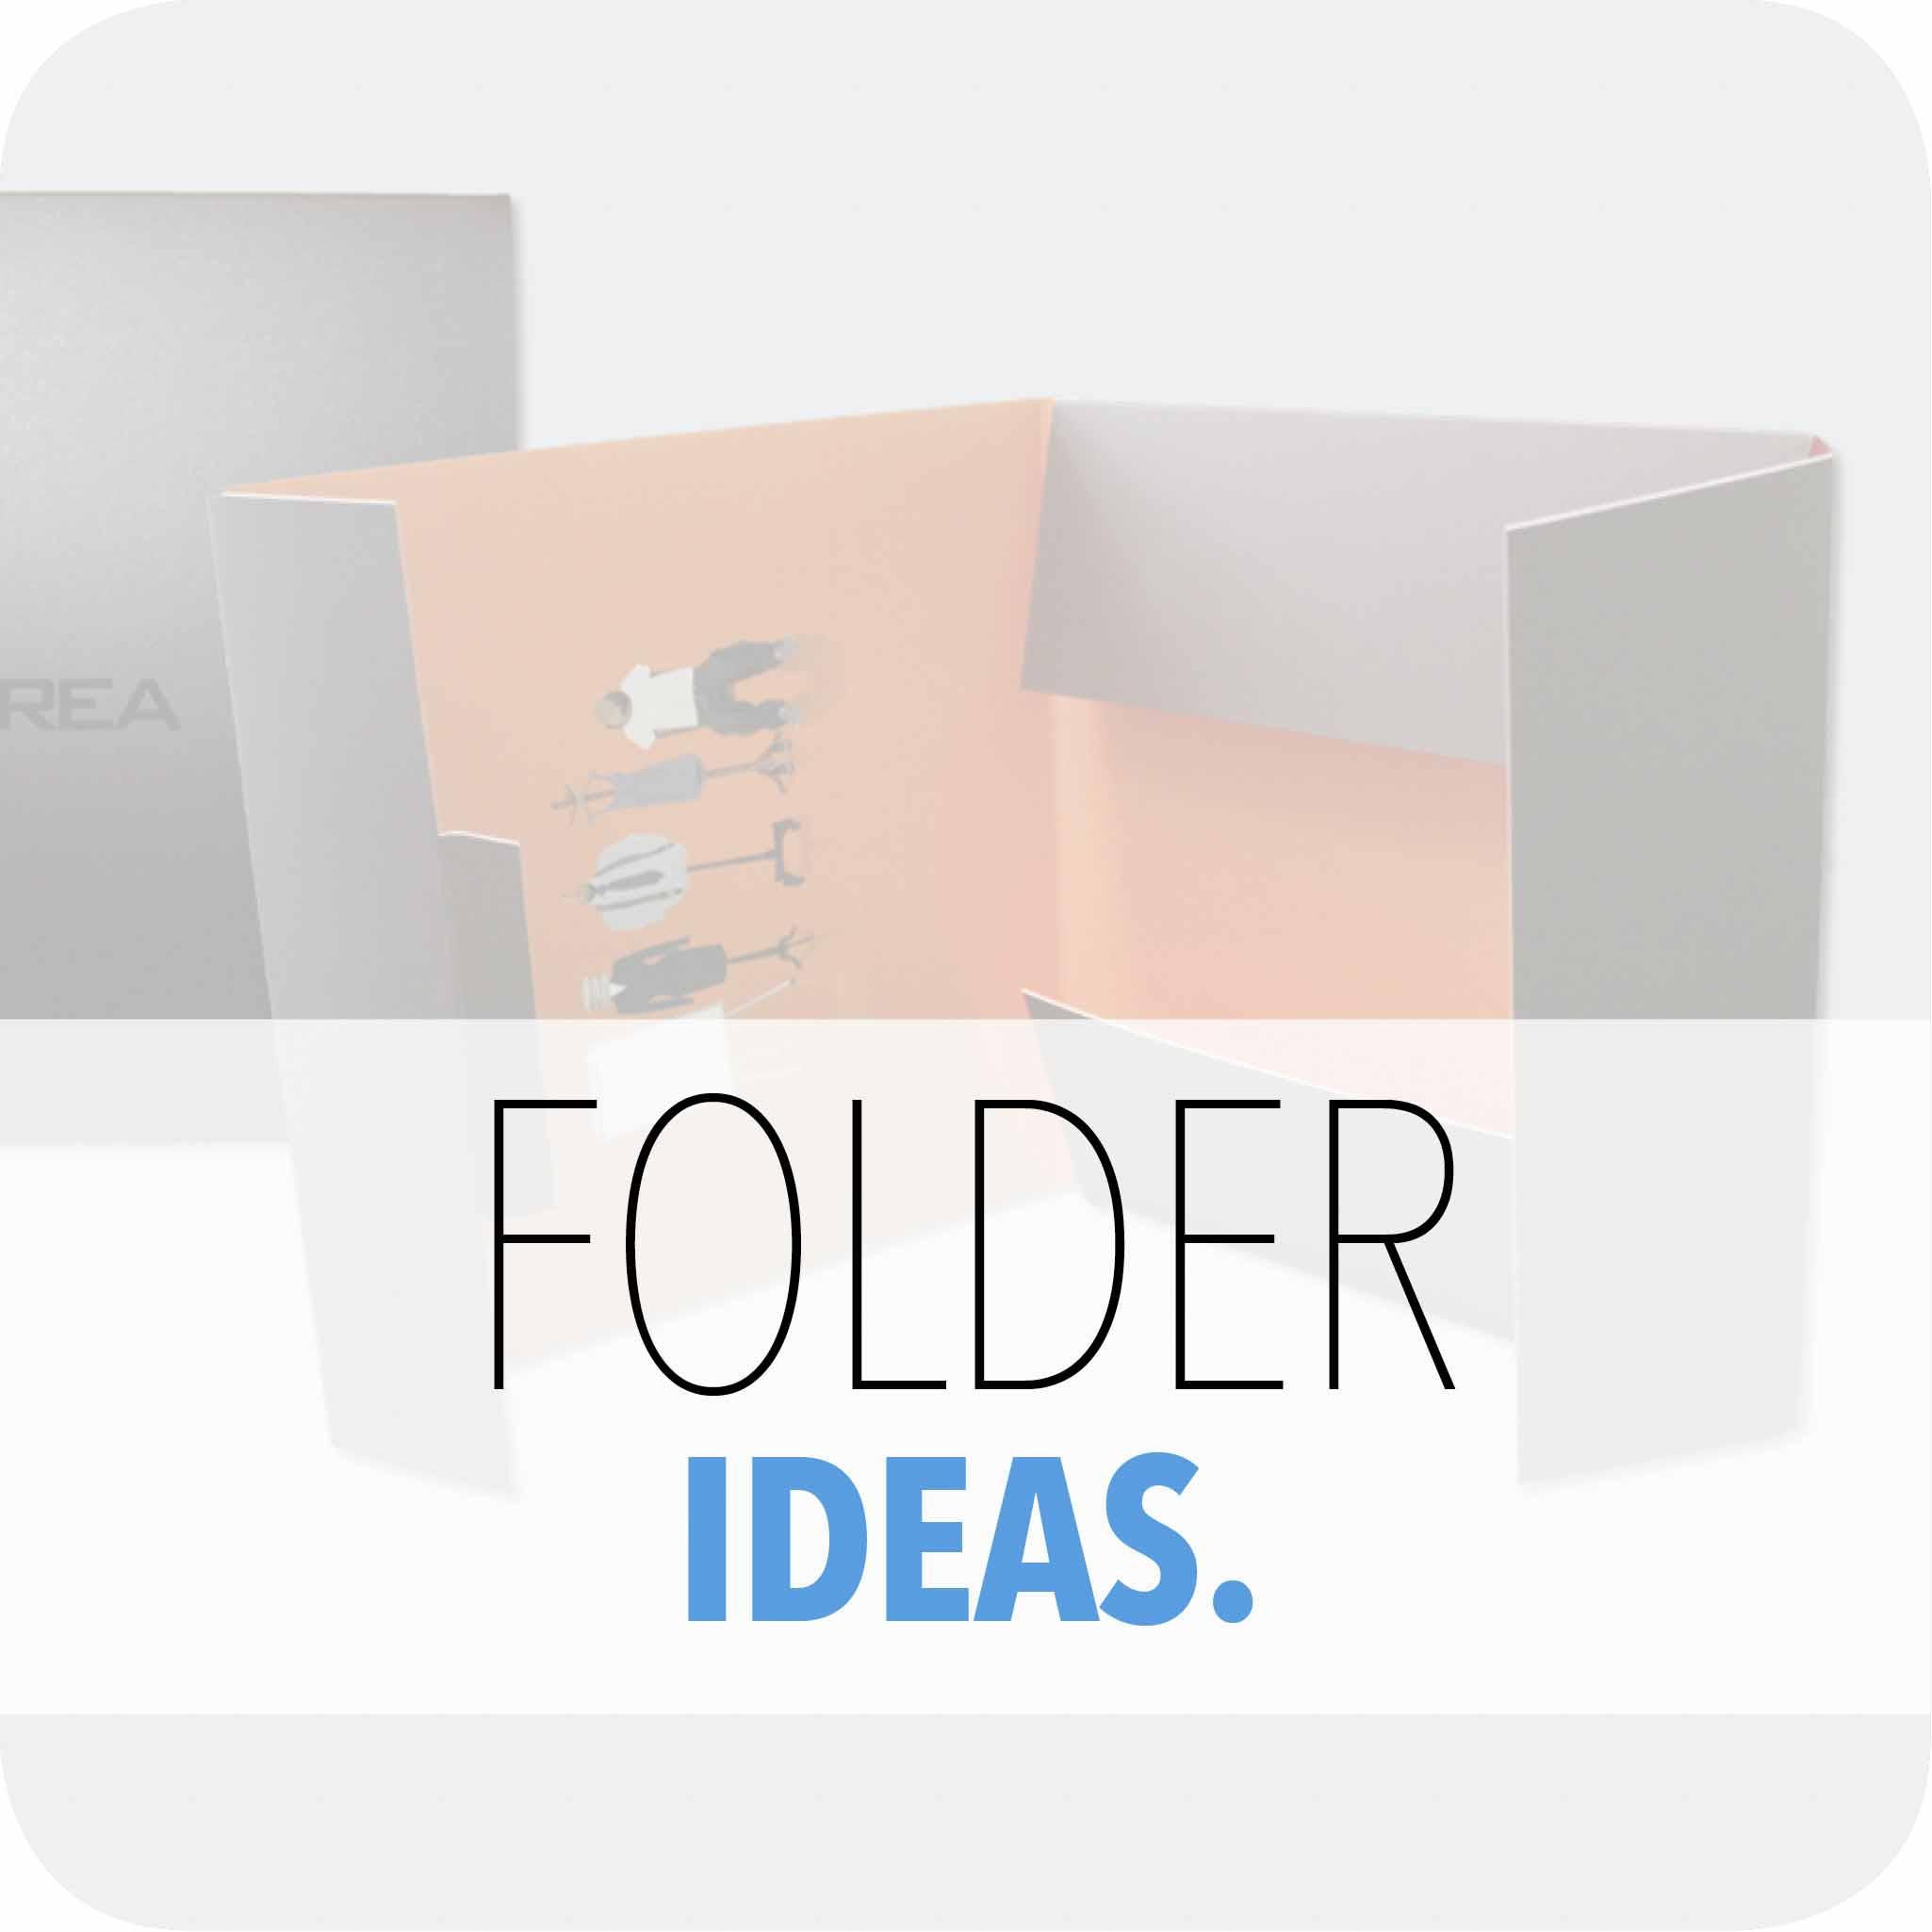 FOLDER-IDEAS